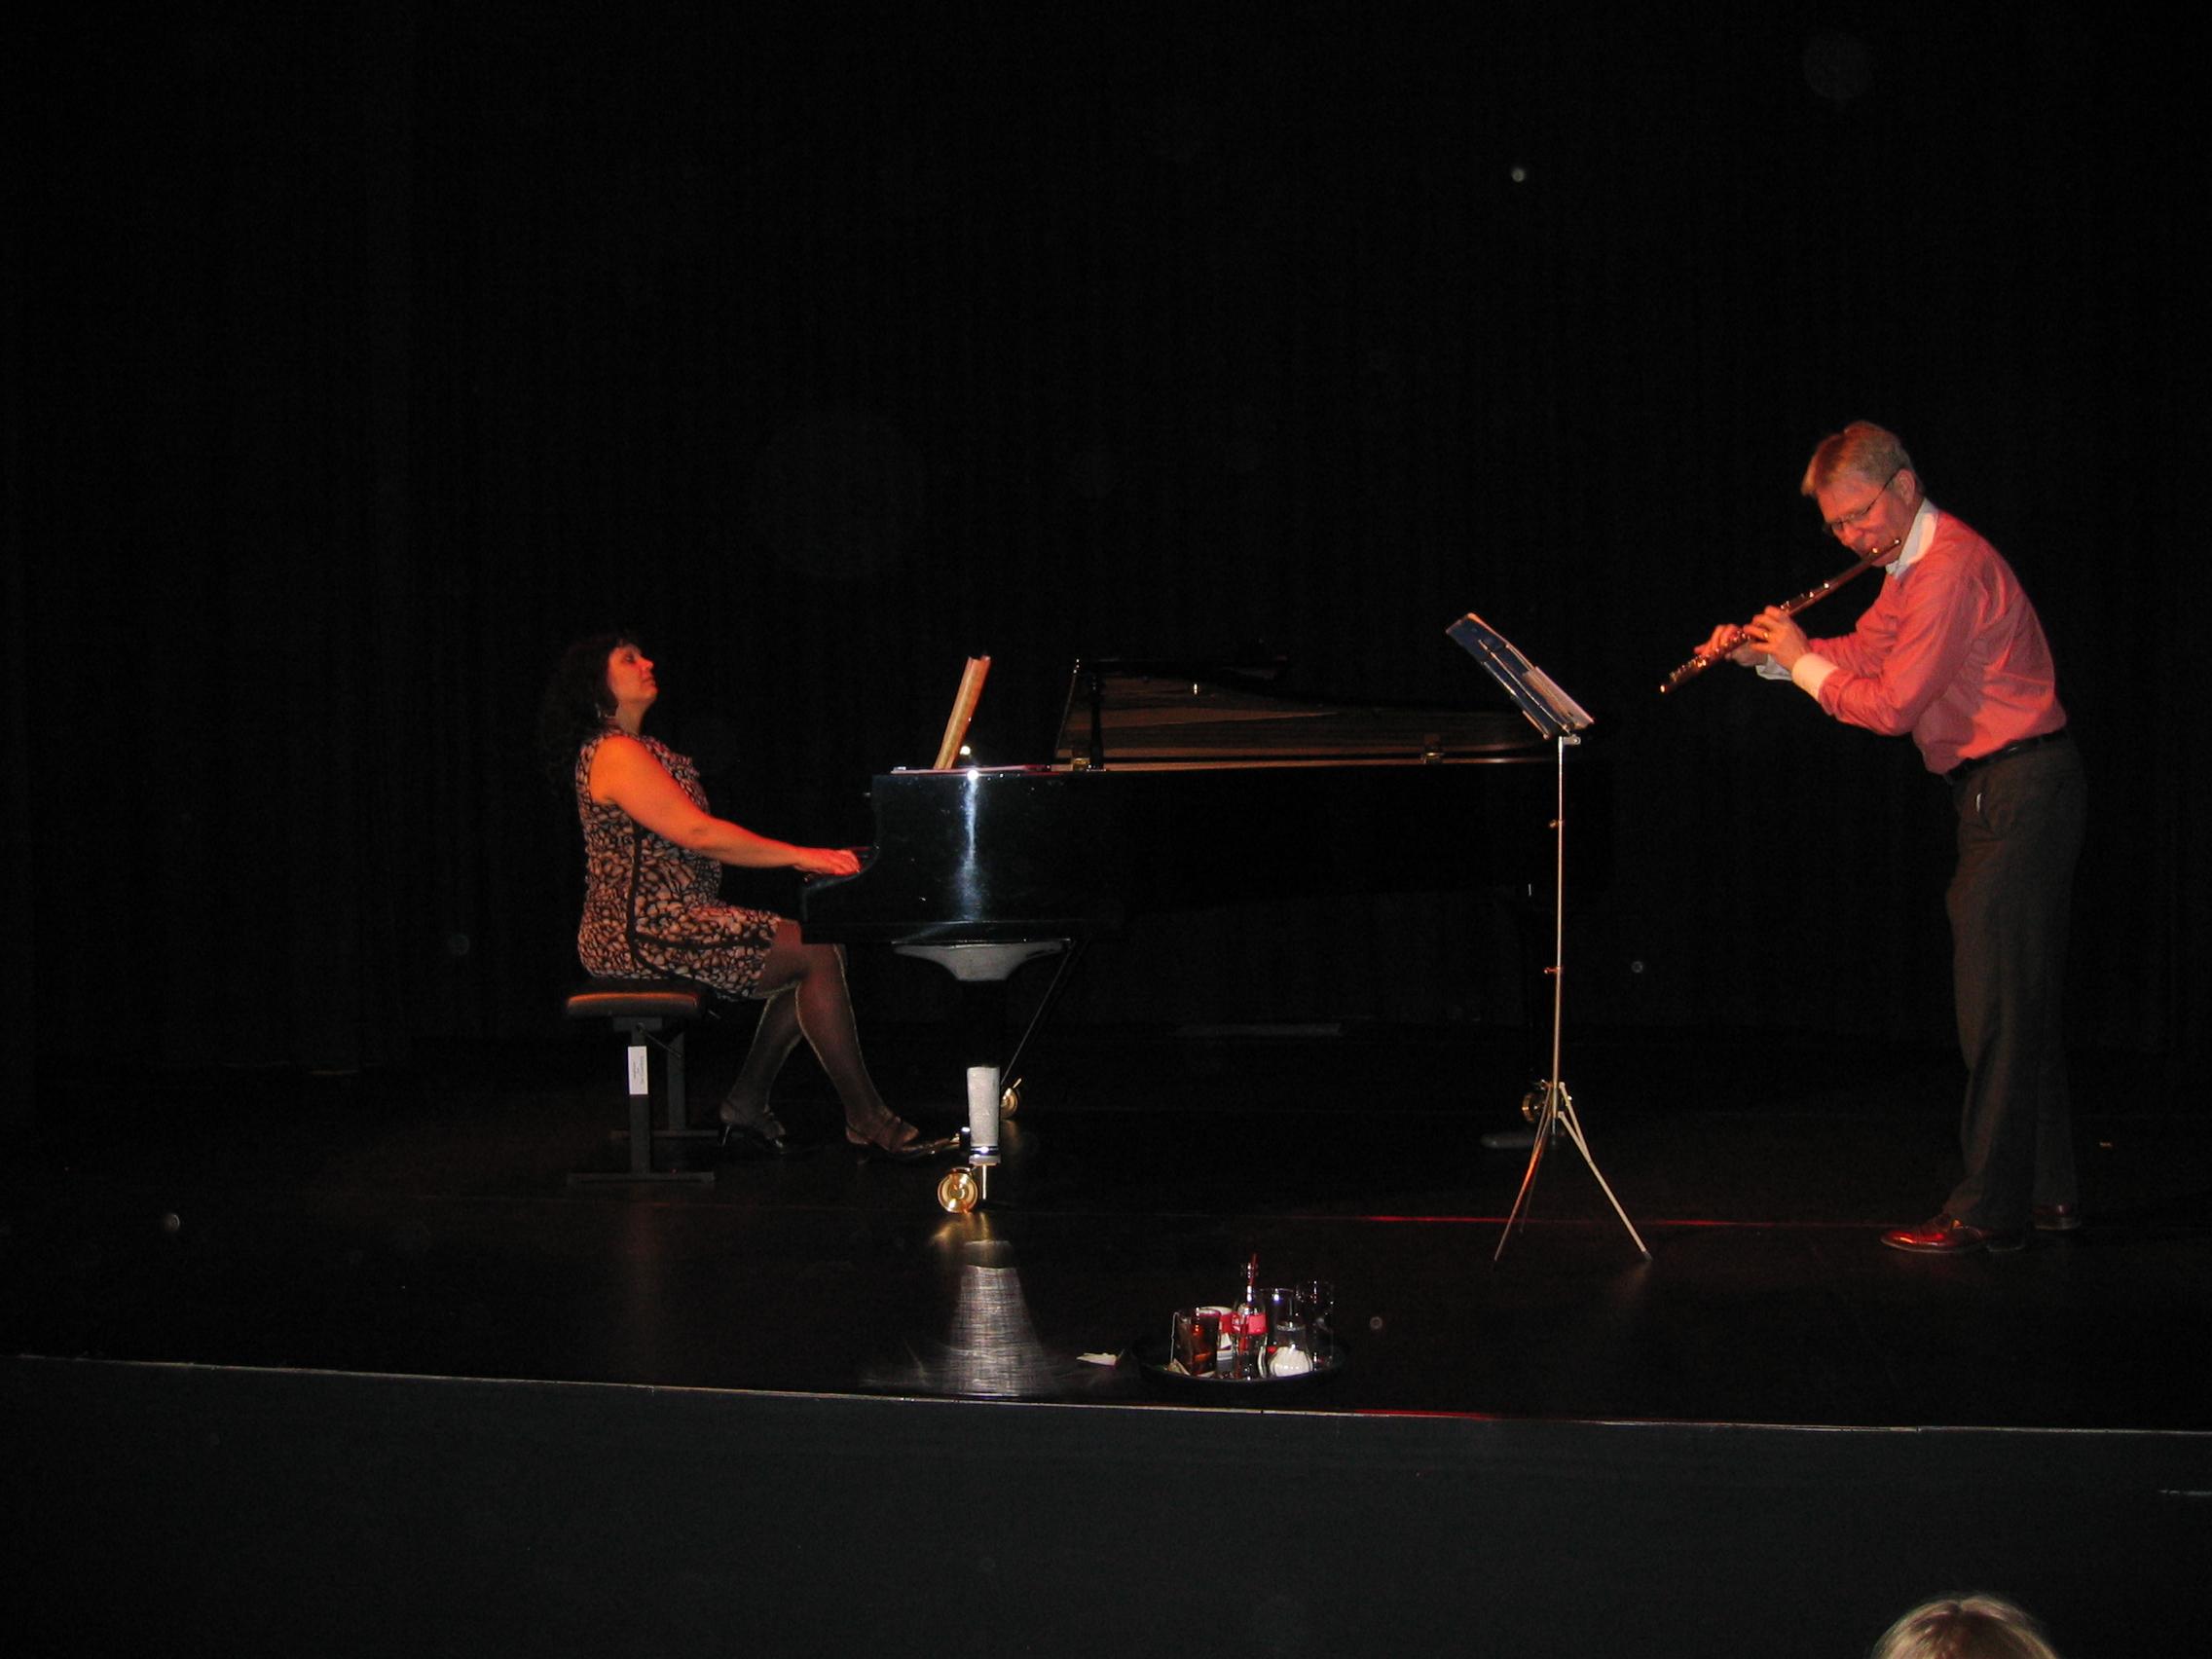 Eveline & Jur Huisman